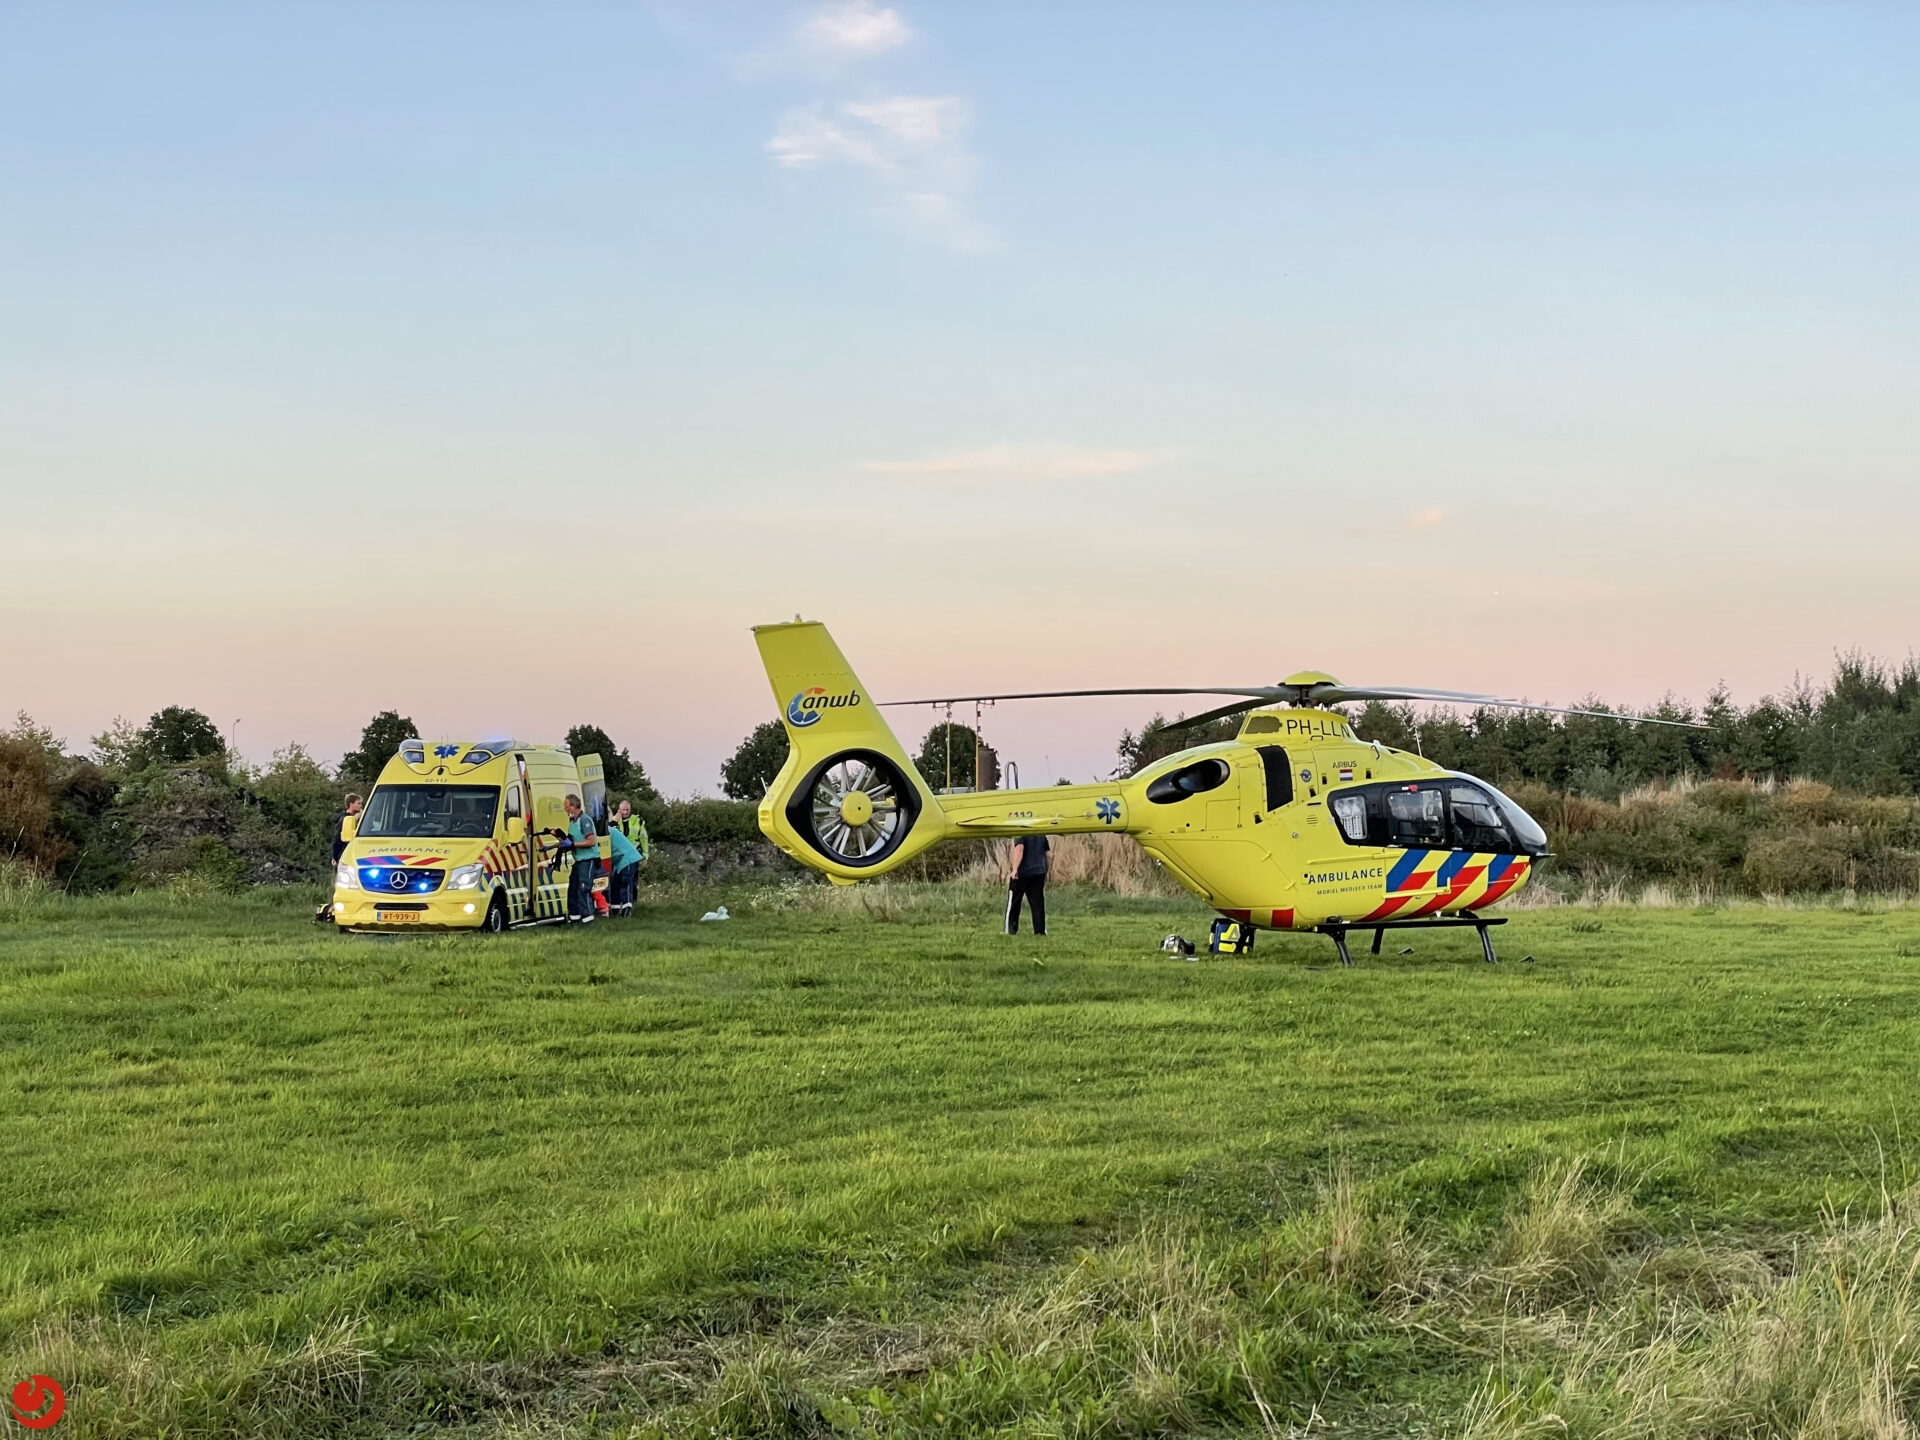 Man op crossmotor crasht op modderbult en raakt zwaargewond in Grou